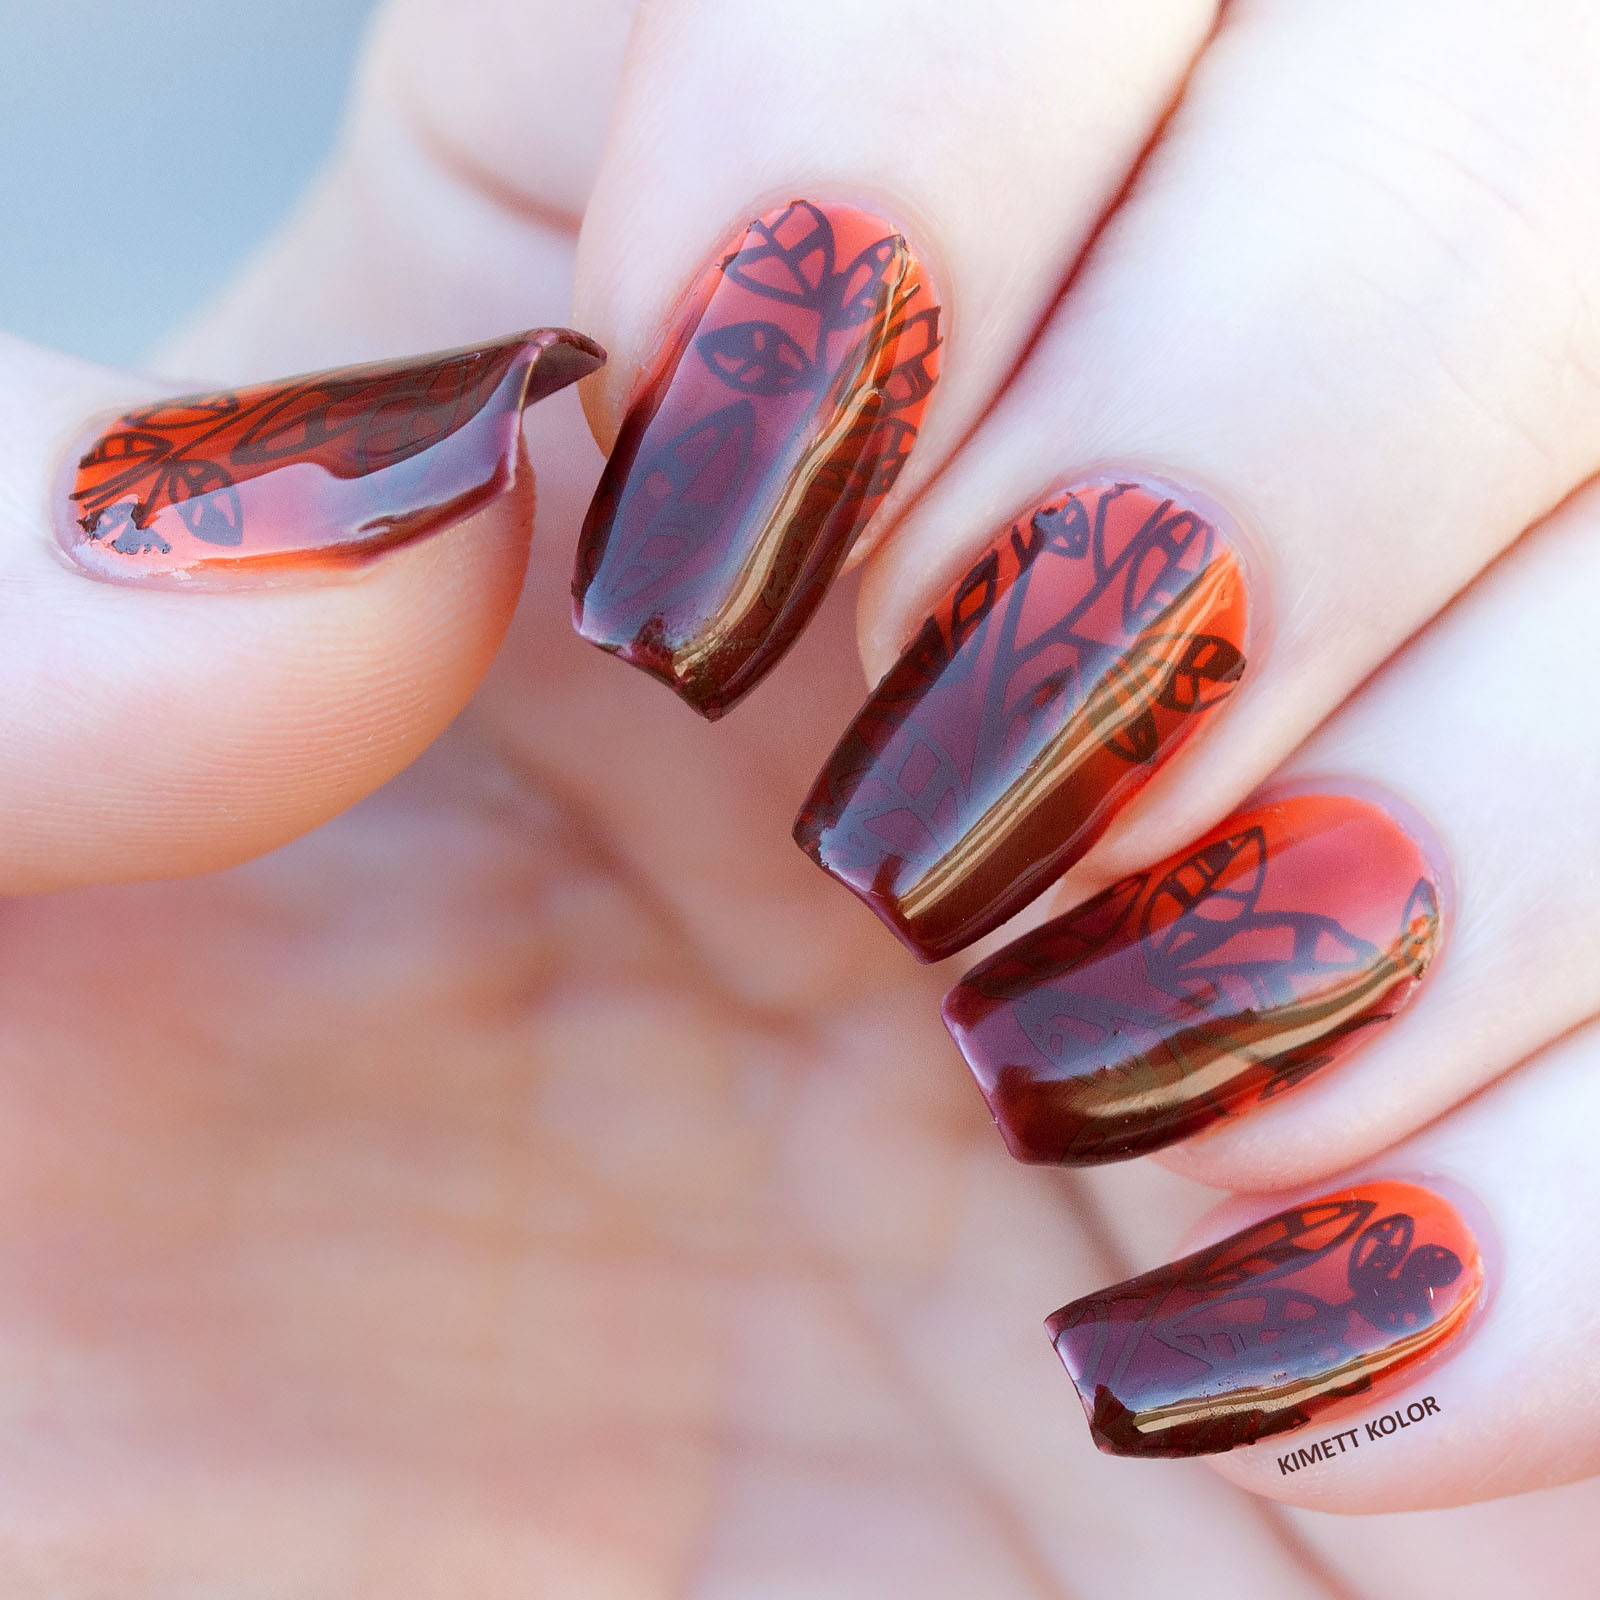 Chocolate Tree Inspired Stamping Nail Art by Kimett Kolor